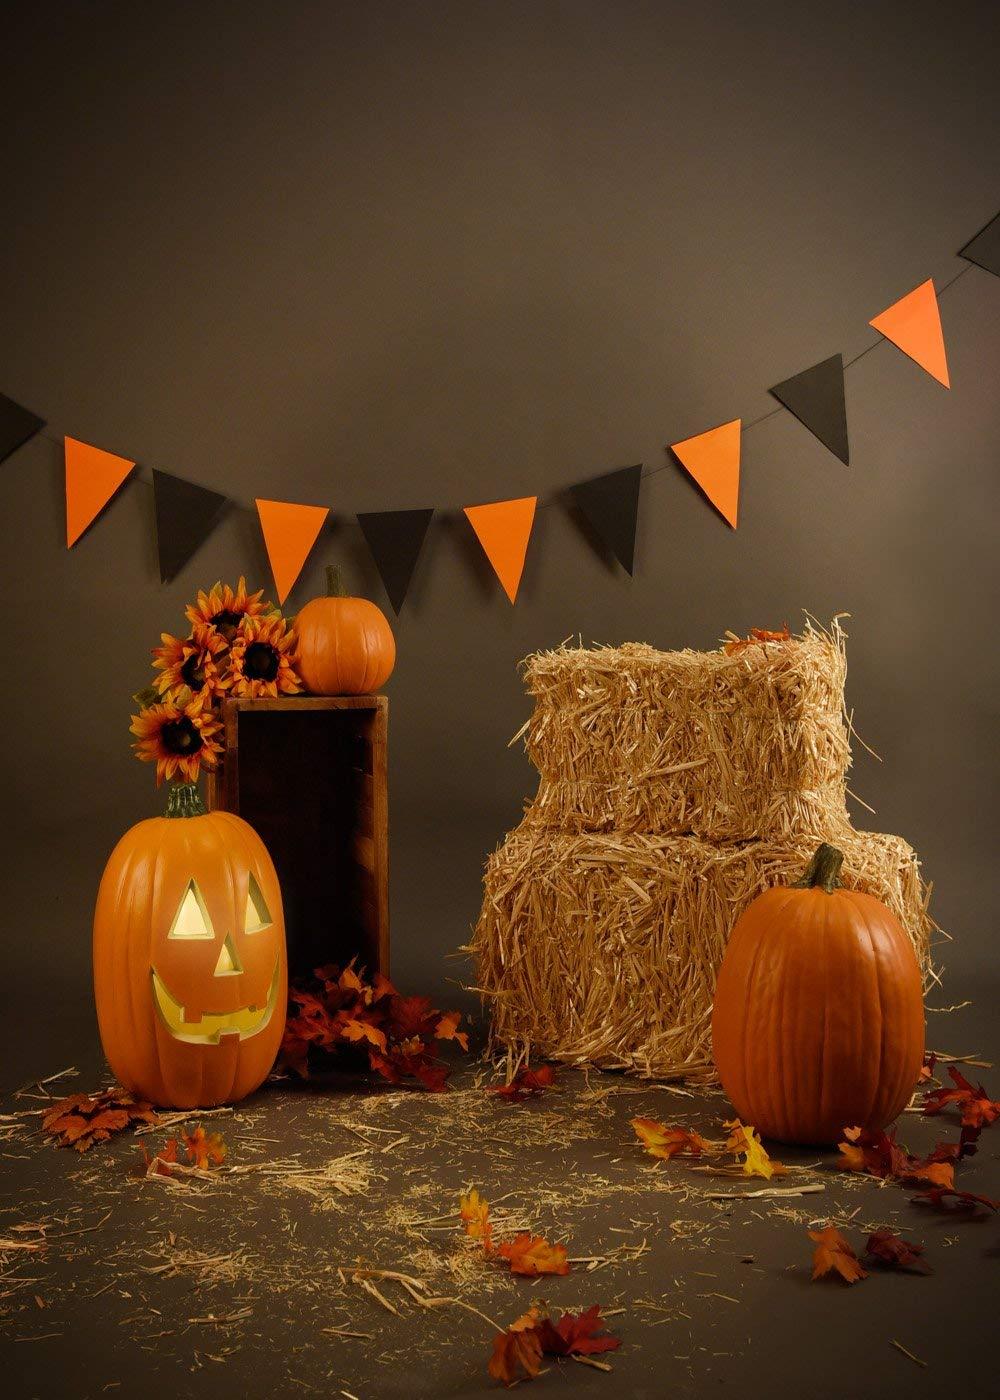 Lyavshi Seamless photo backdrops Halloween pumpkin pure color portrait countryside background computer printing fantasy props enlarge